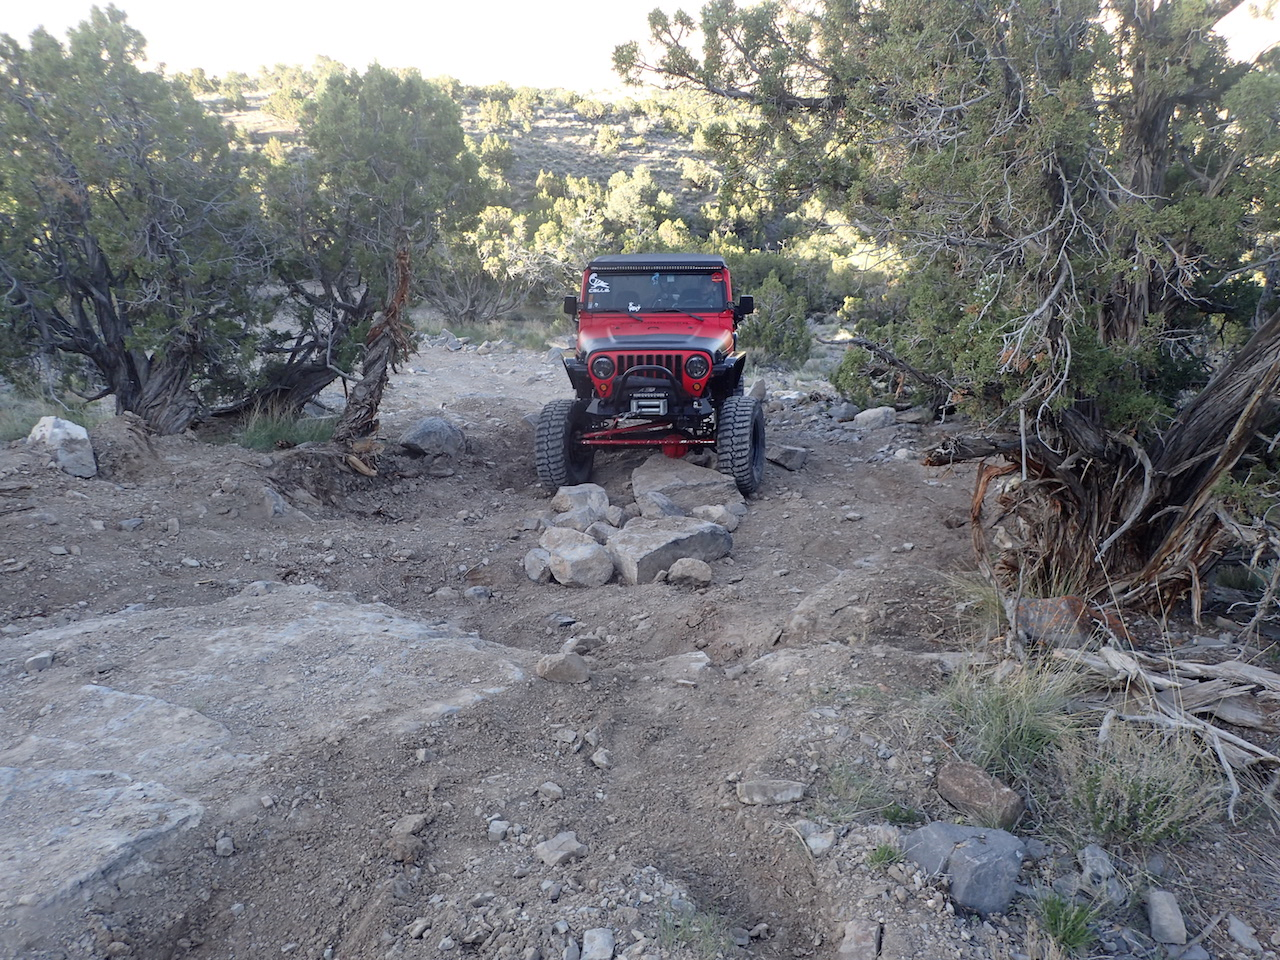 Sidewinder Exit - Waypoint 6: Big Rock In Middle